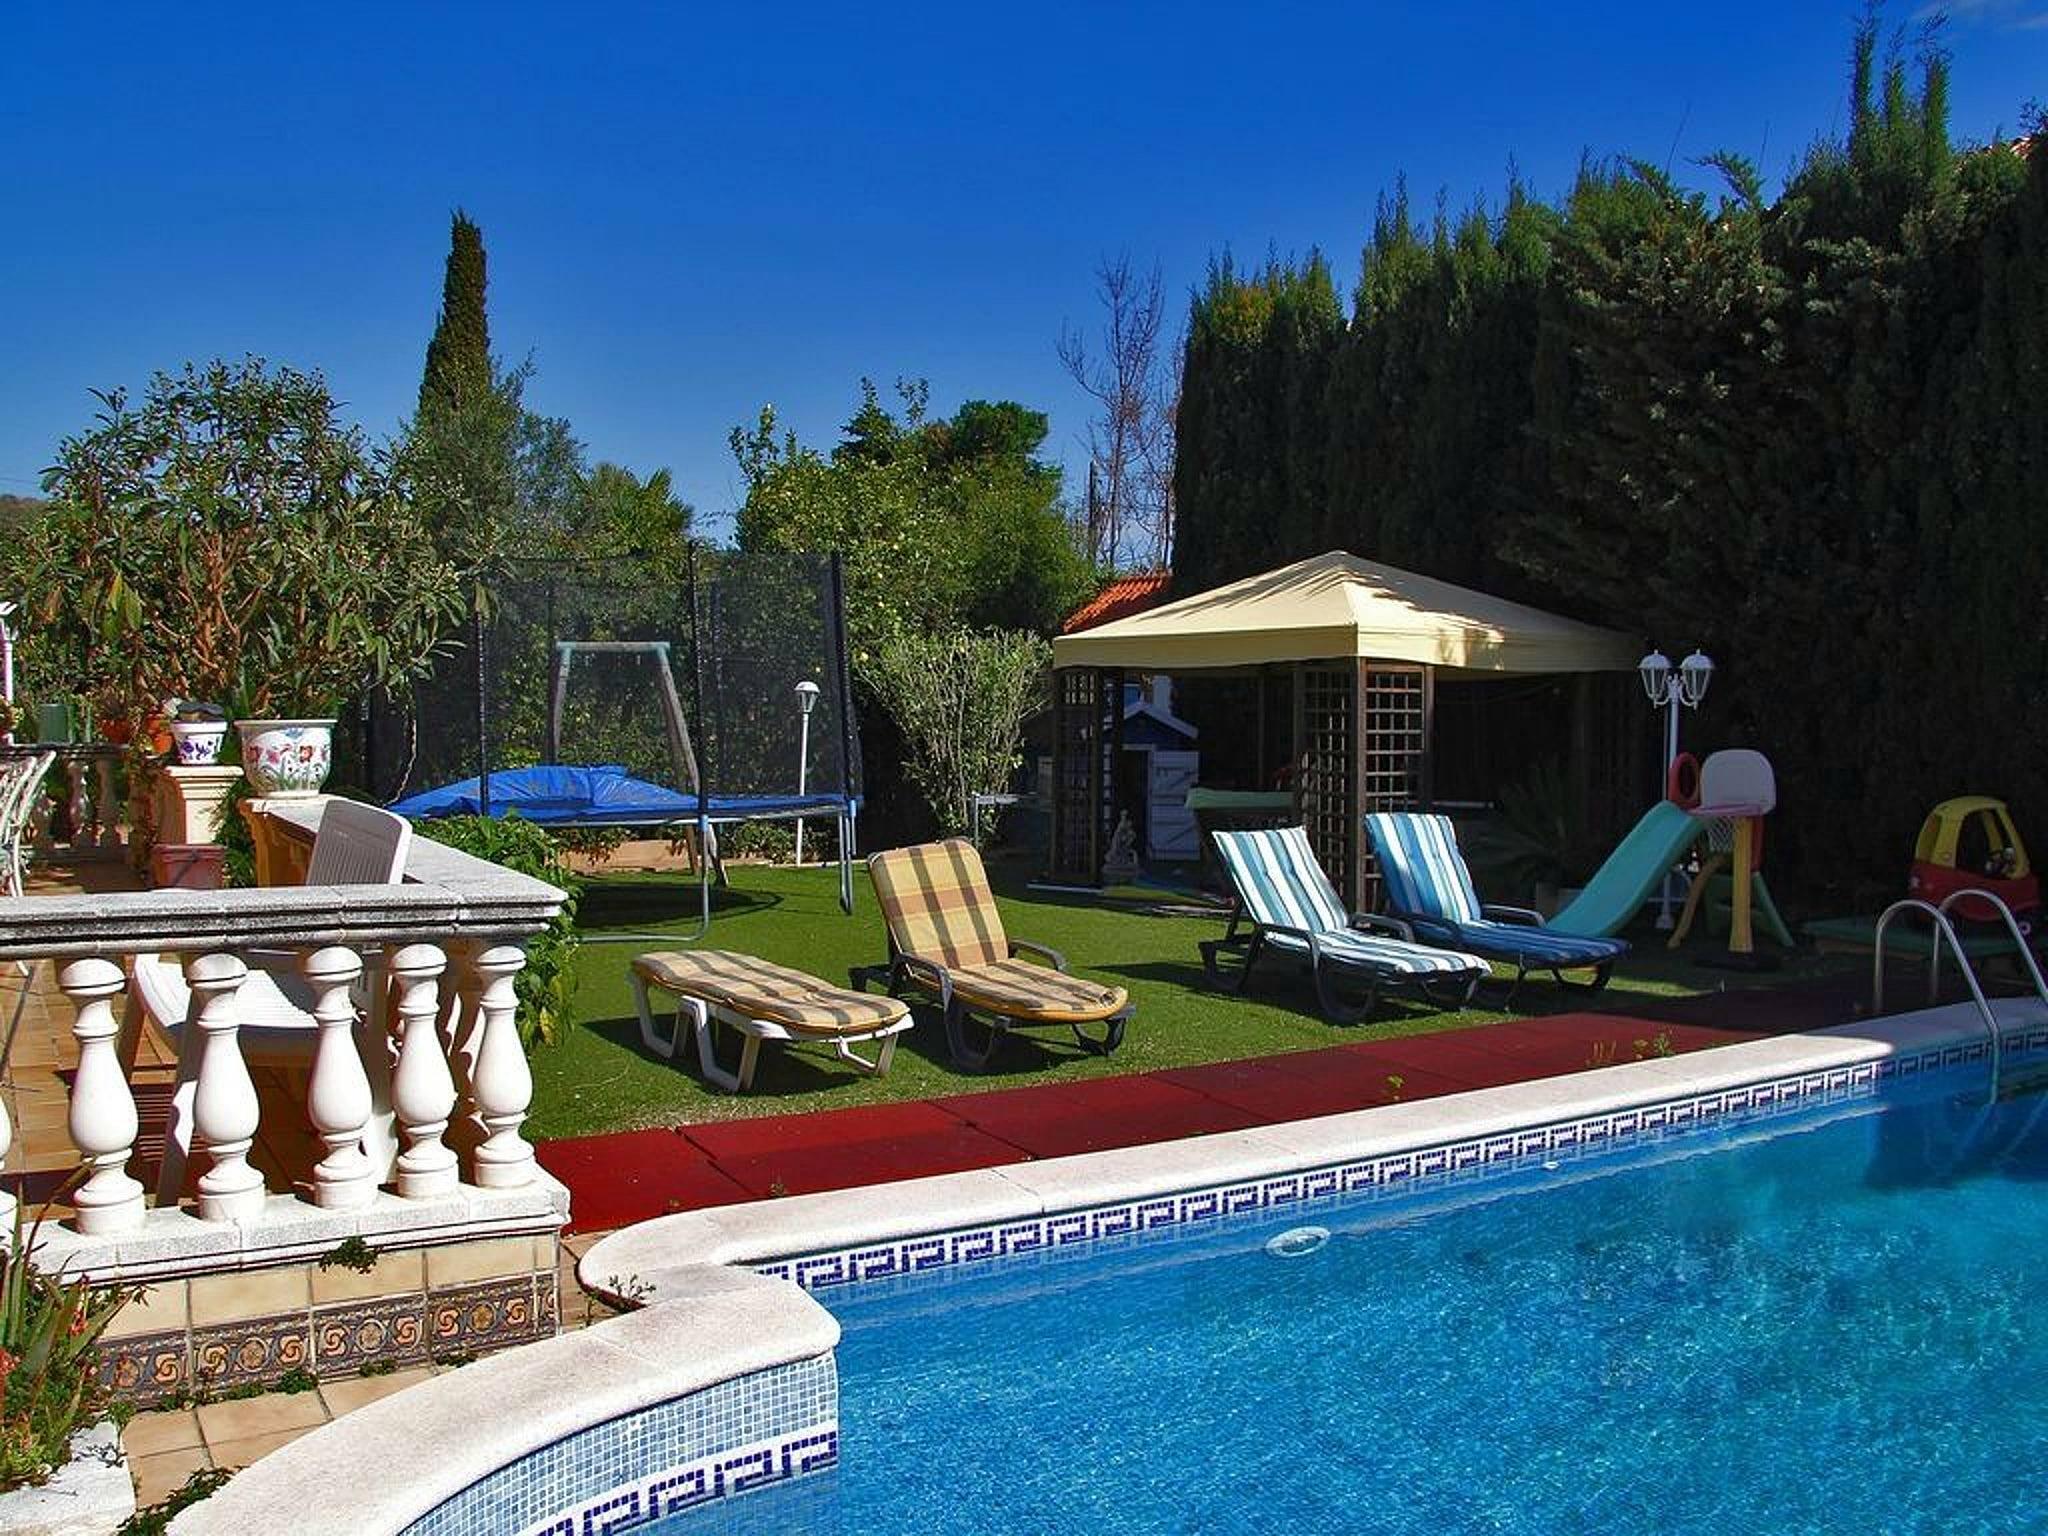 Location de vacances castellar del vall s appartements - Appartement de vacances barcelone mesura ...